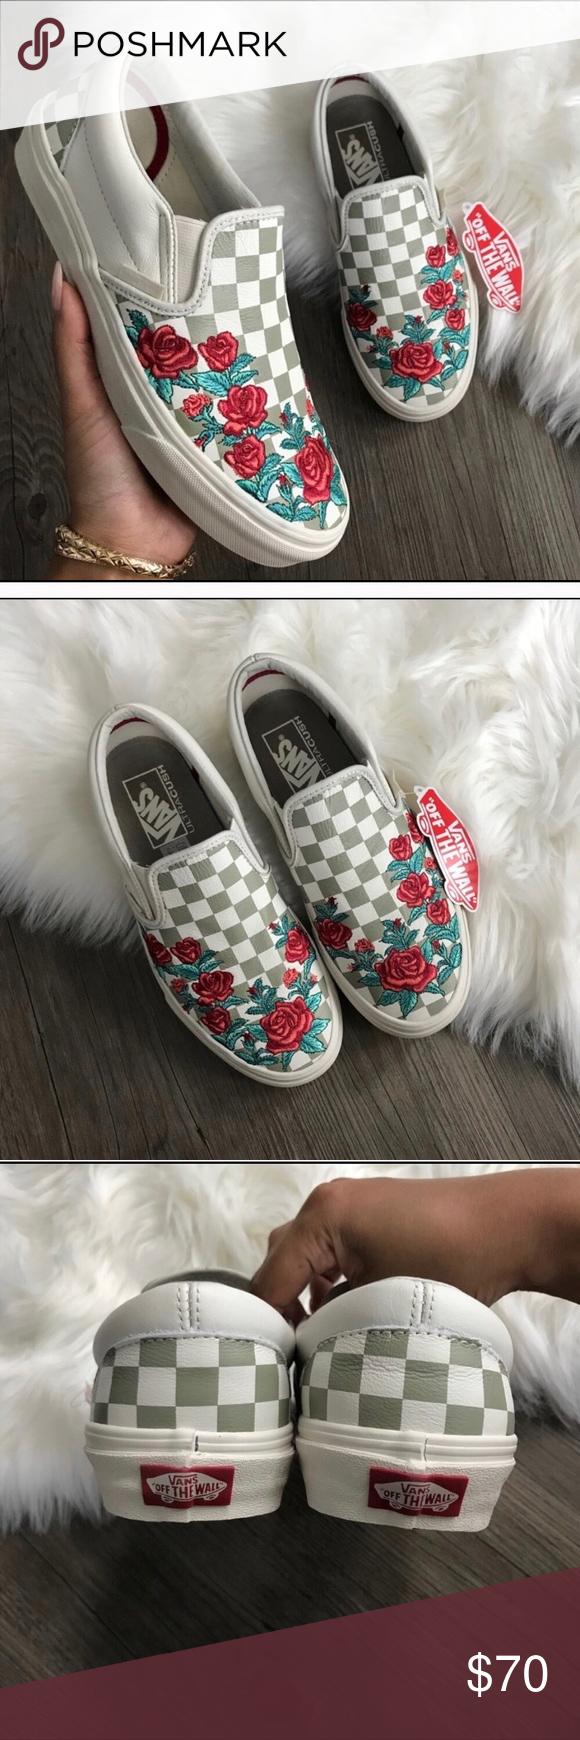 Floral print checkered vans🌹 | Vans